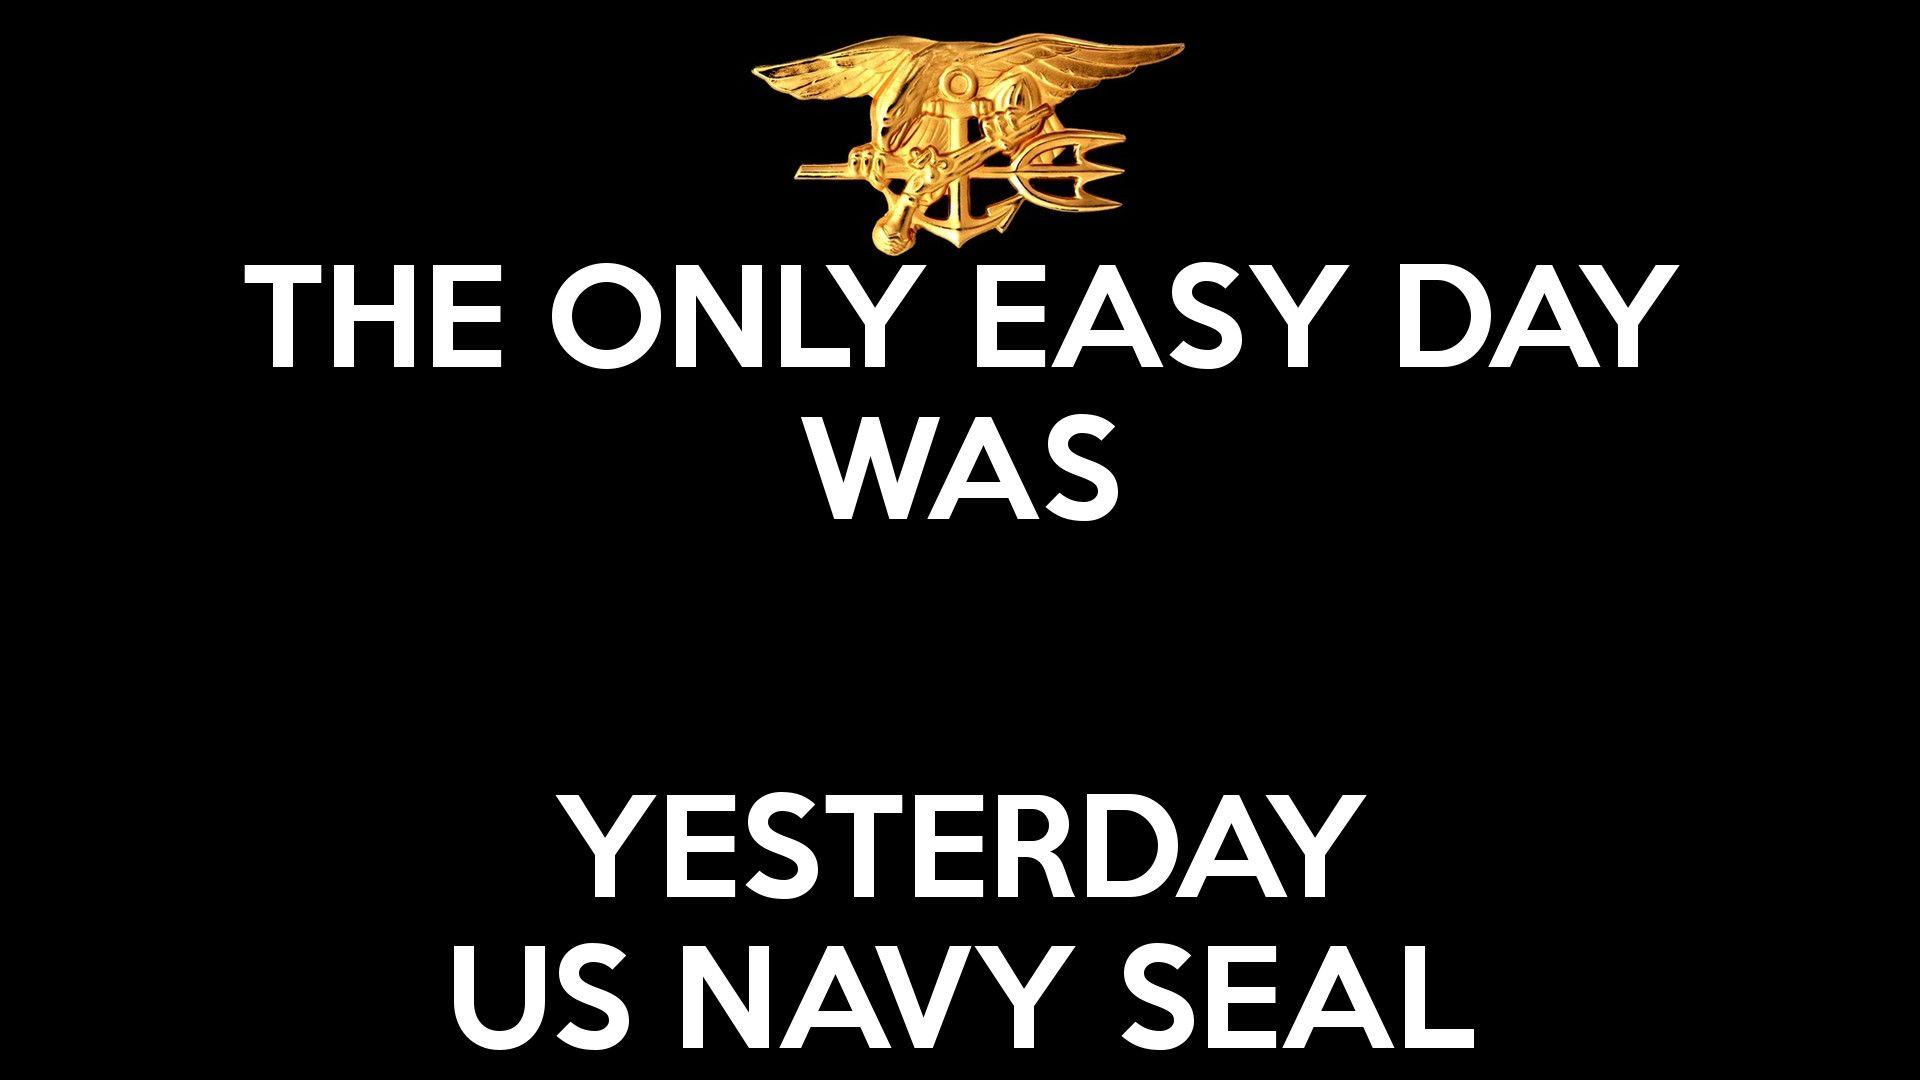 Us Navy Seal Logo Wallpaper 56 Images Navy Seals Us Navy Seals Navy Seal Wallpaper